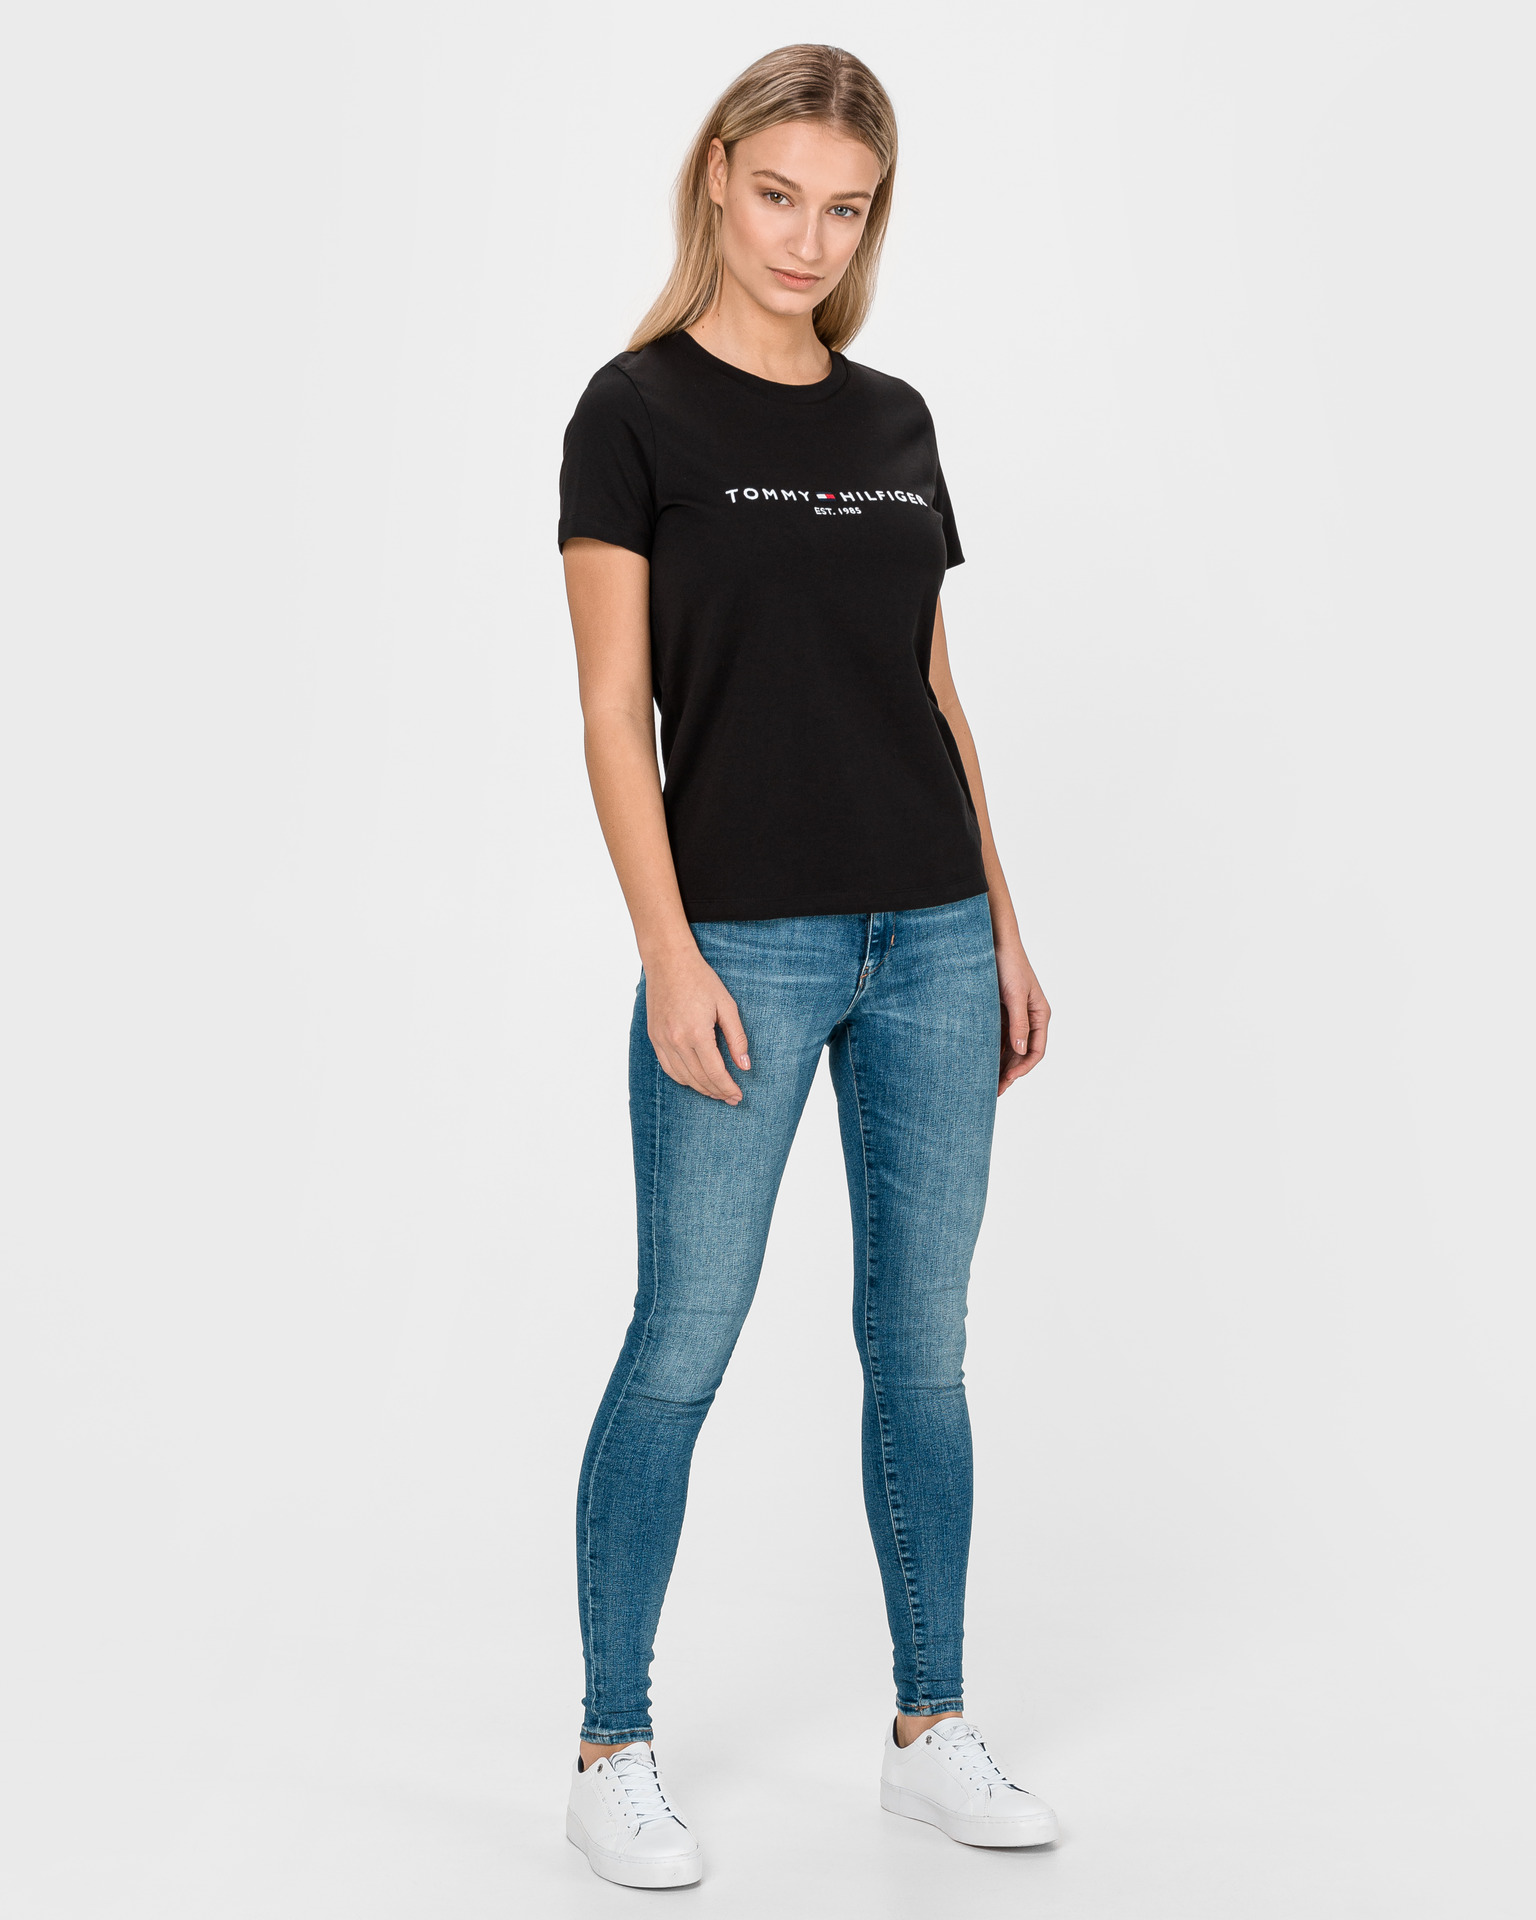 Tommy Hilfiger czarny damska koszulka Essential